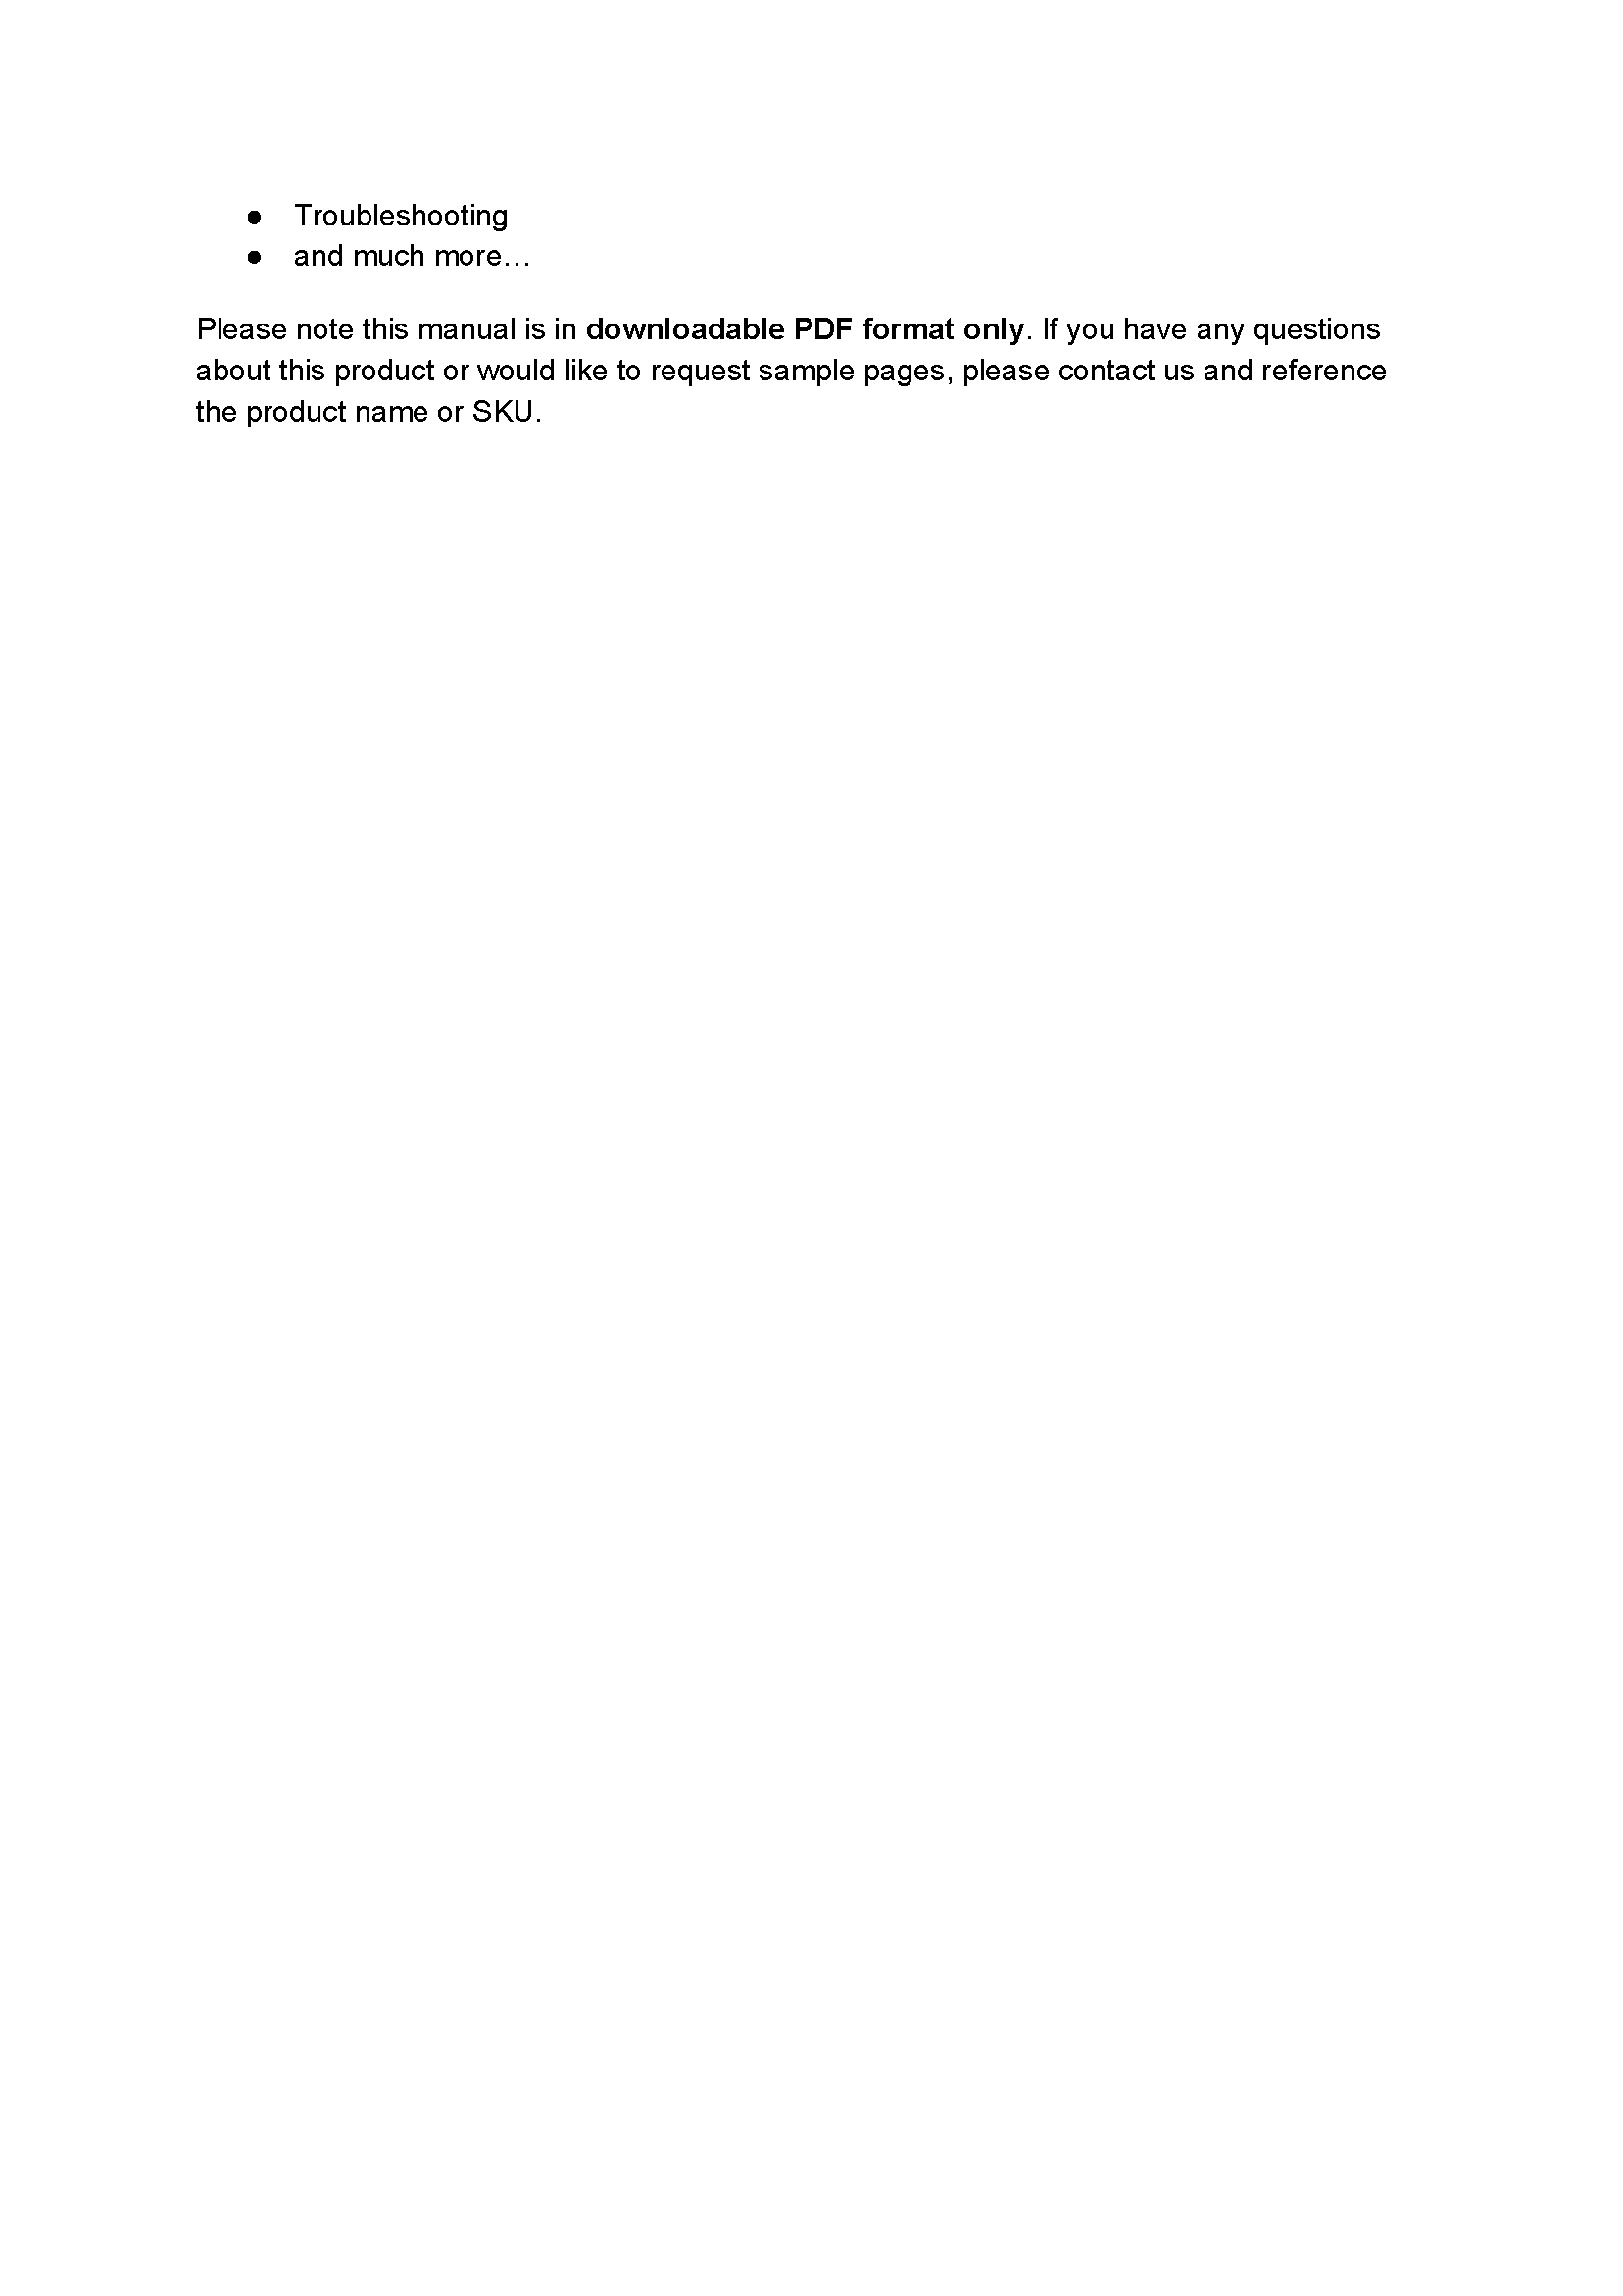 John Deere 4940 Self-Propelled Sprayers manual pdf